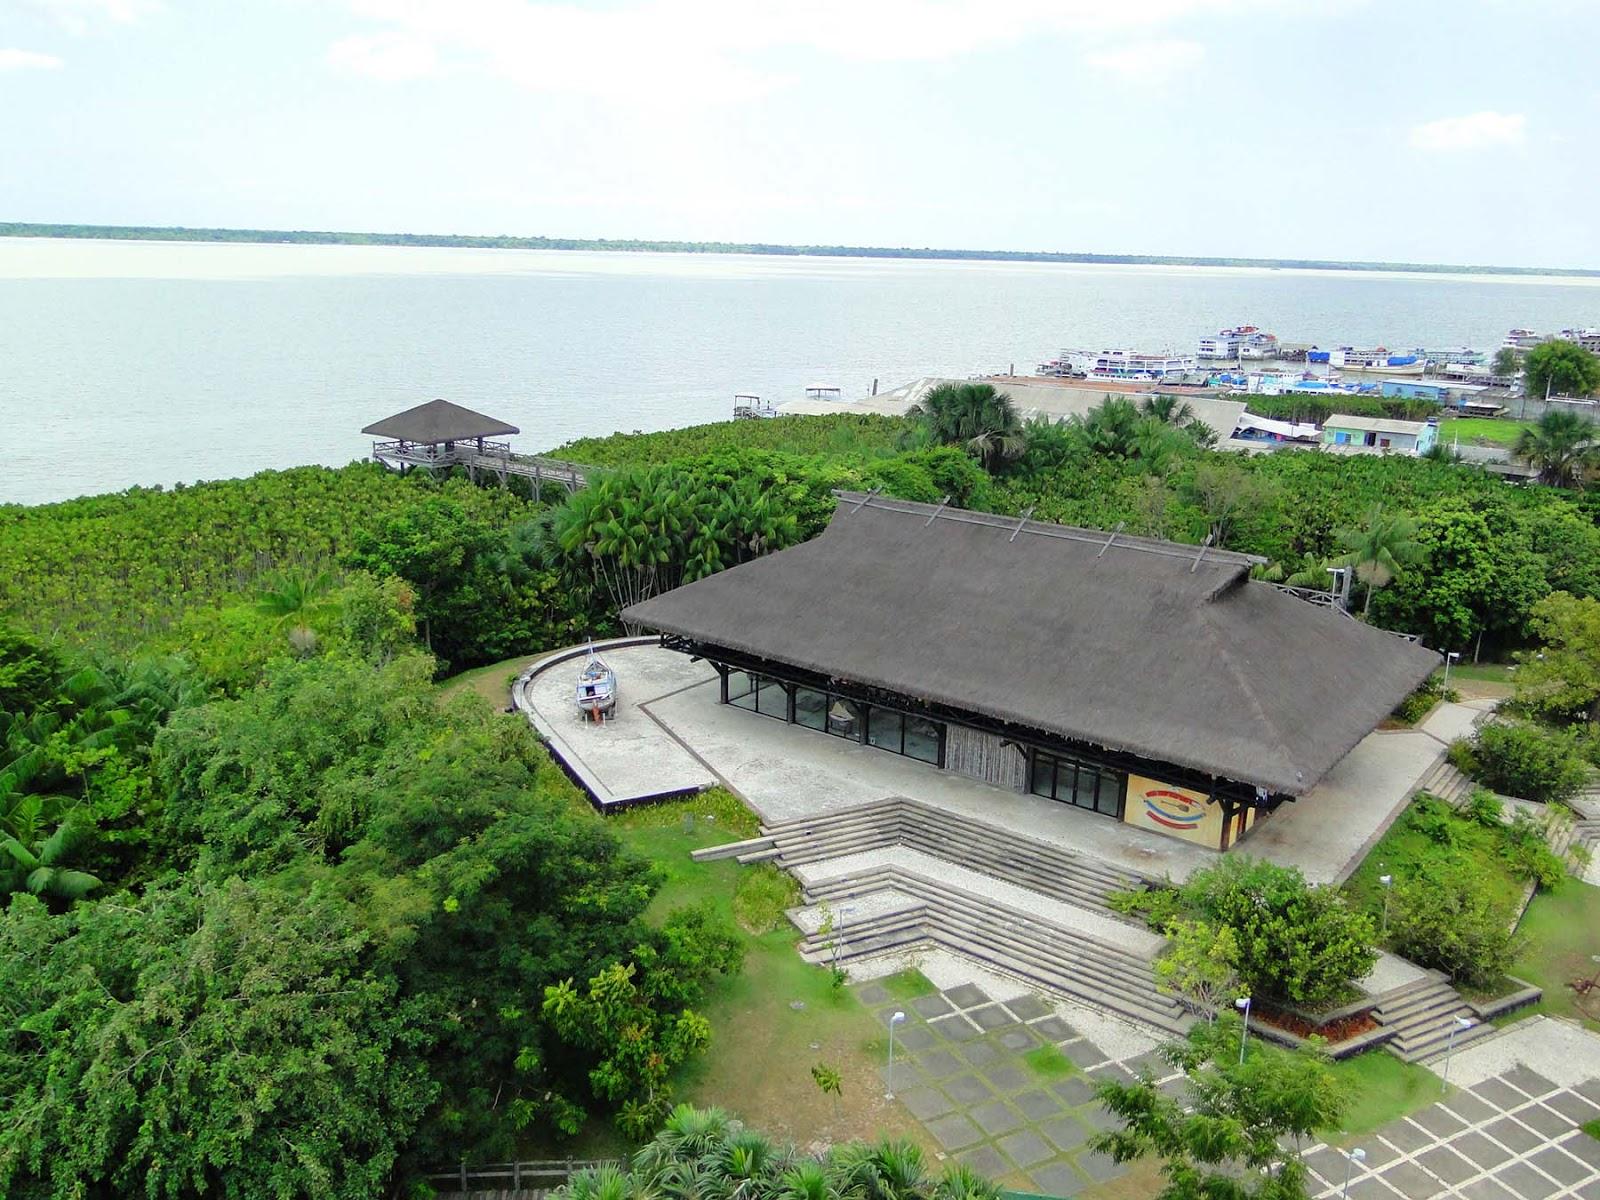 Mangal das Garças,Belém do Pará